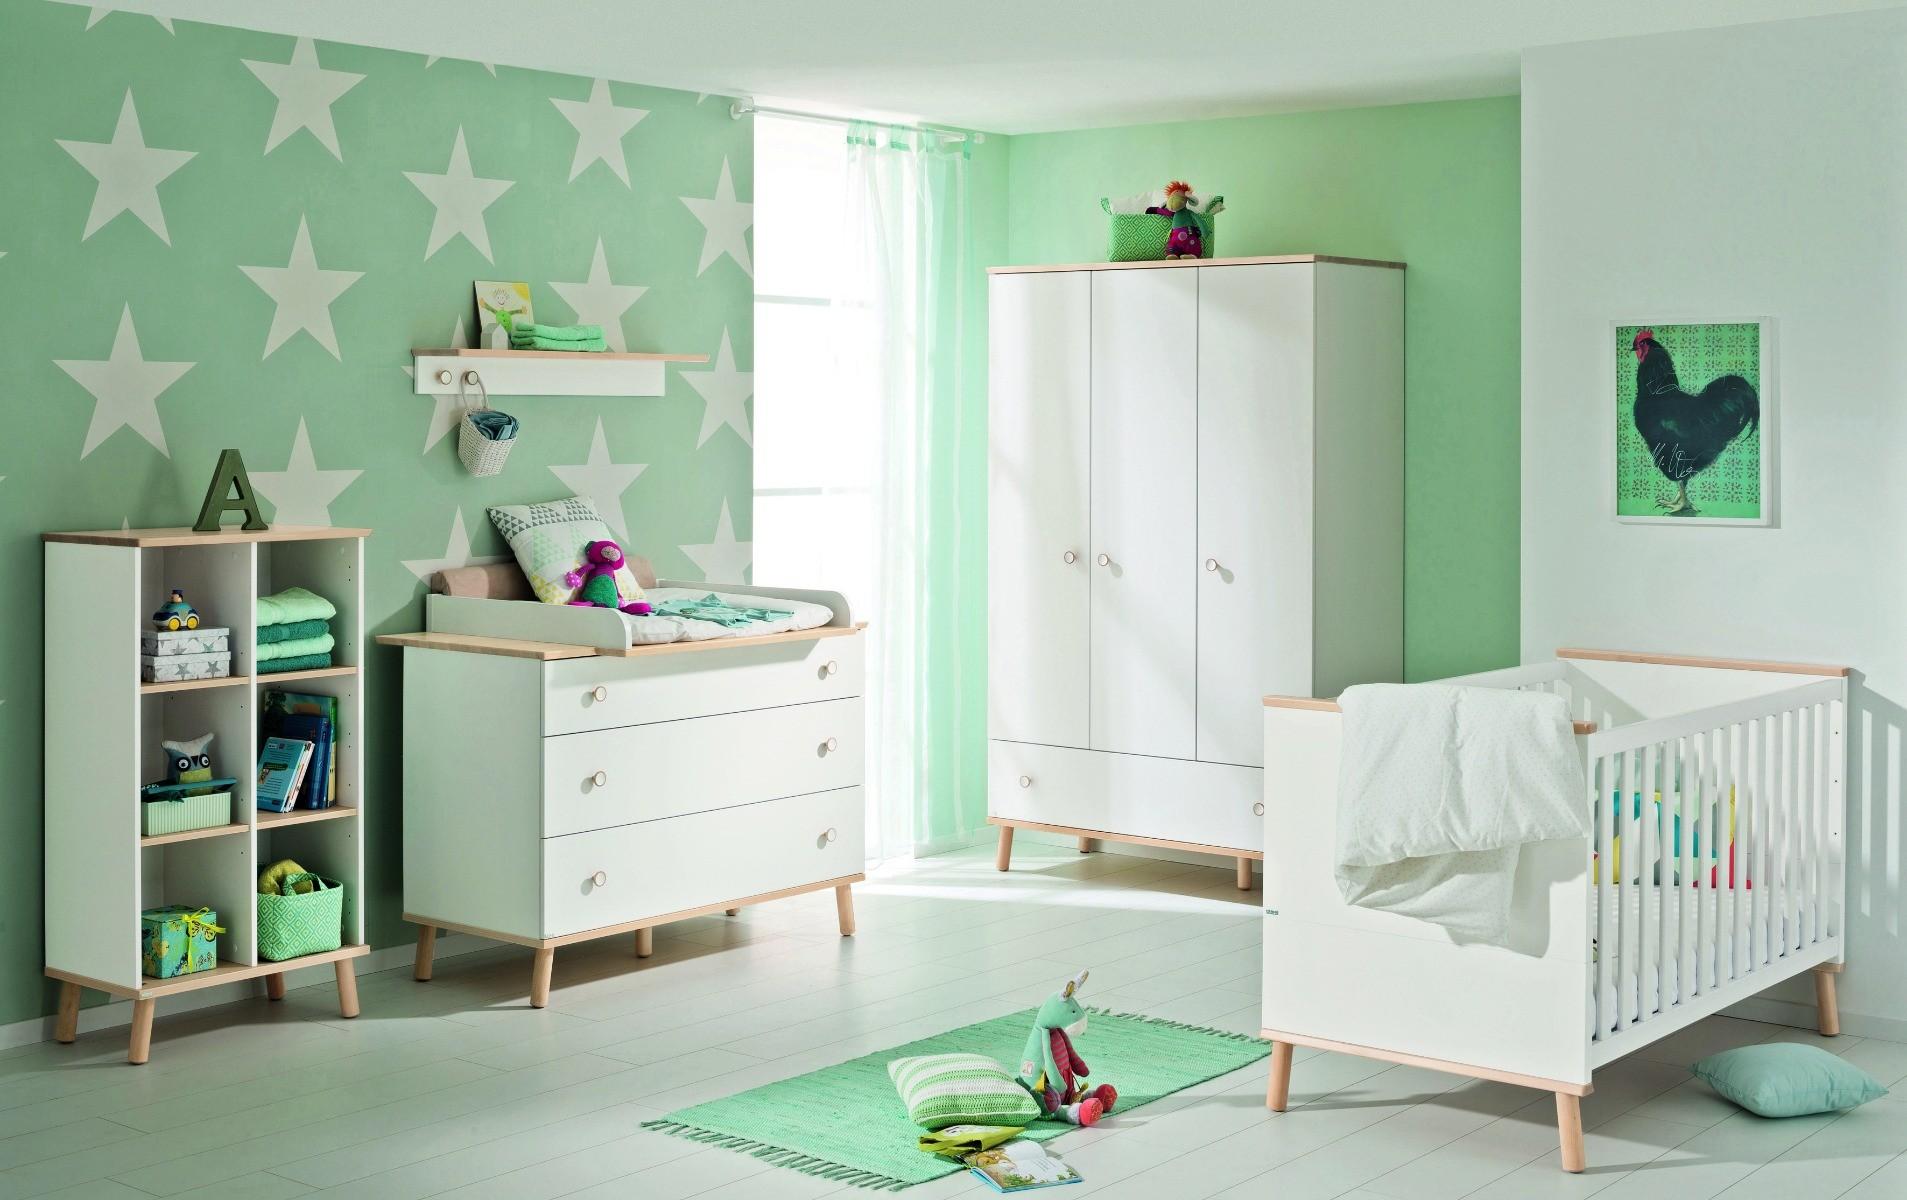 Complete Babykamer 3 Delig.Paidi Complete 3 Delige Babykamer Ylvie Online Kopen Babyplanet